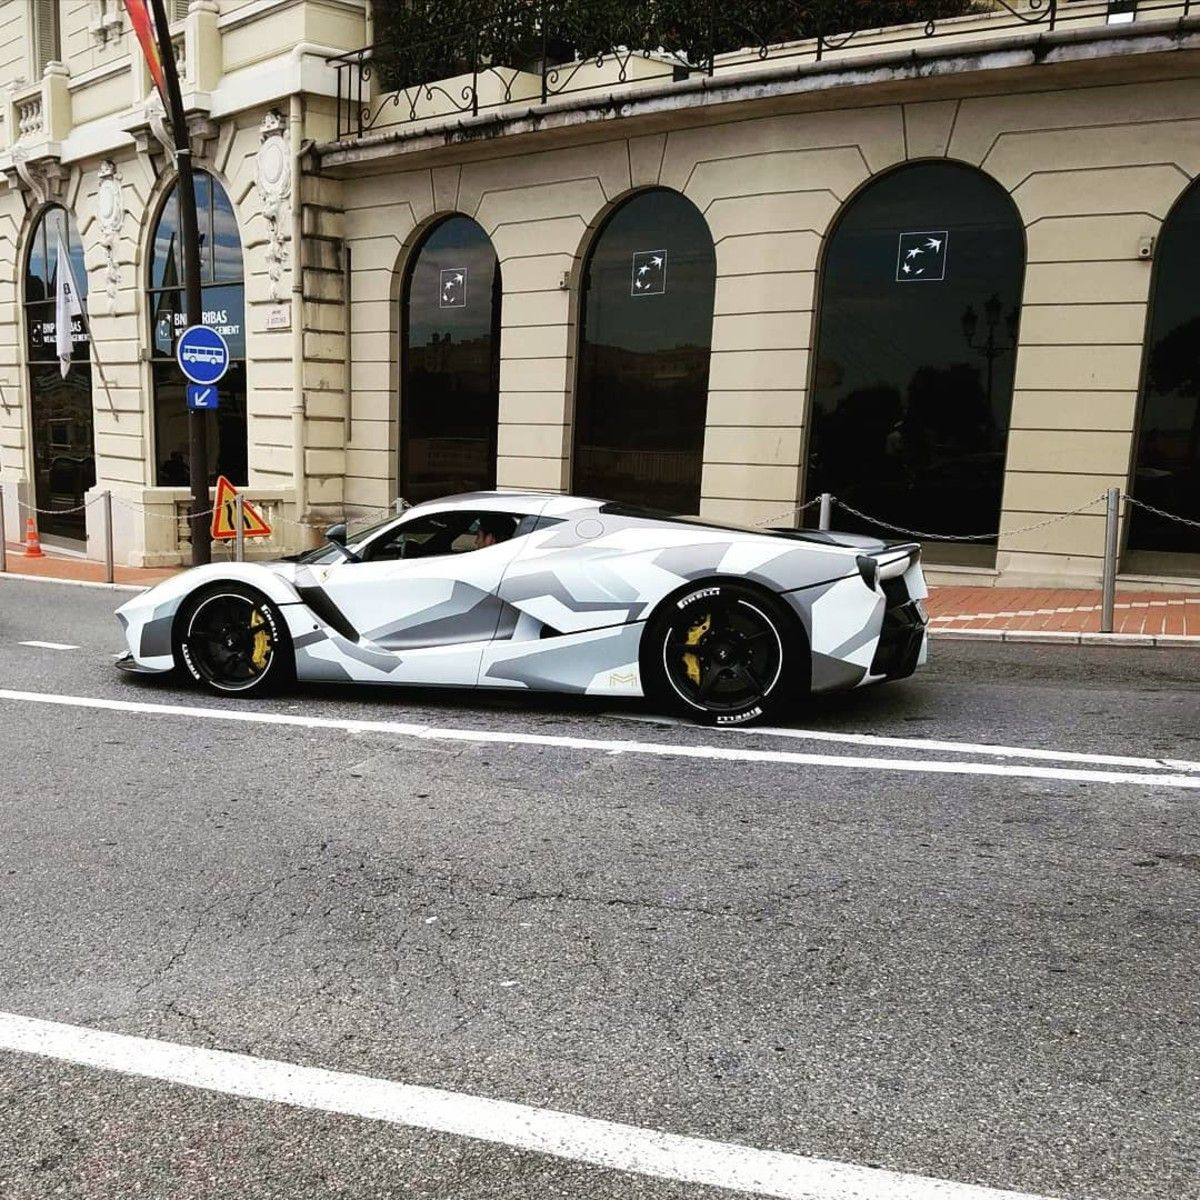 La Ferrari, Ferrari, Amazing Cars